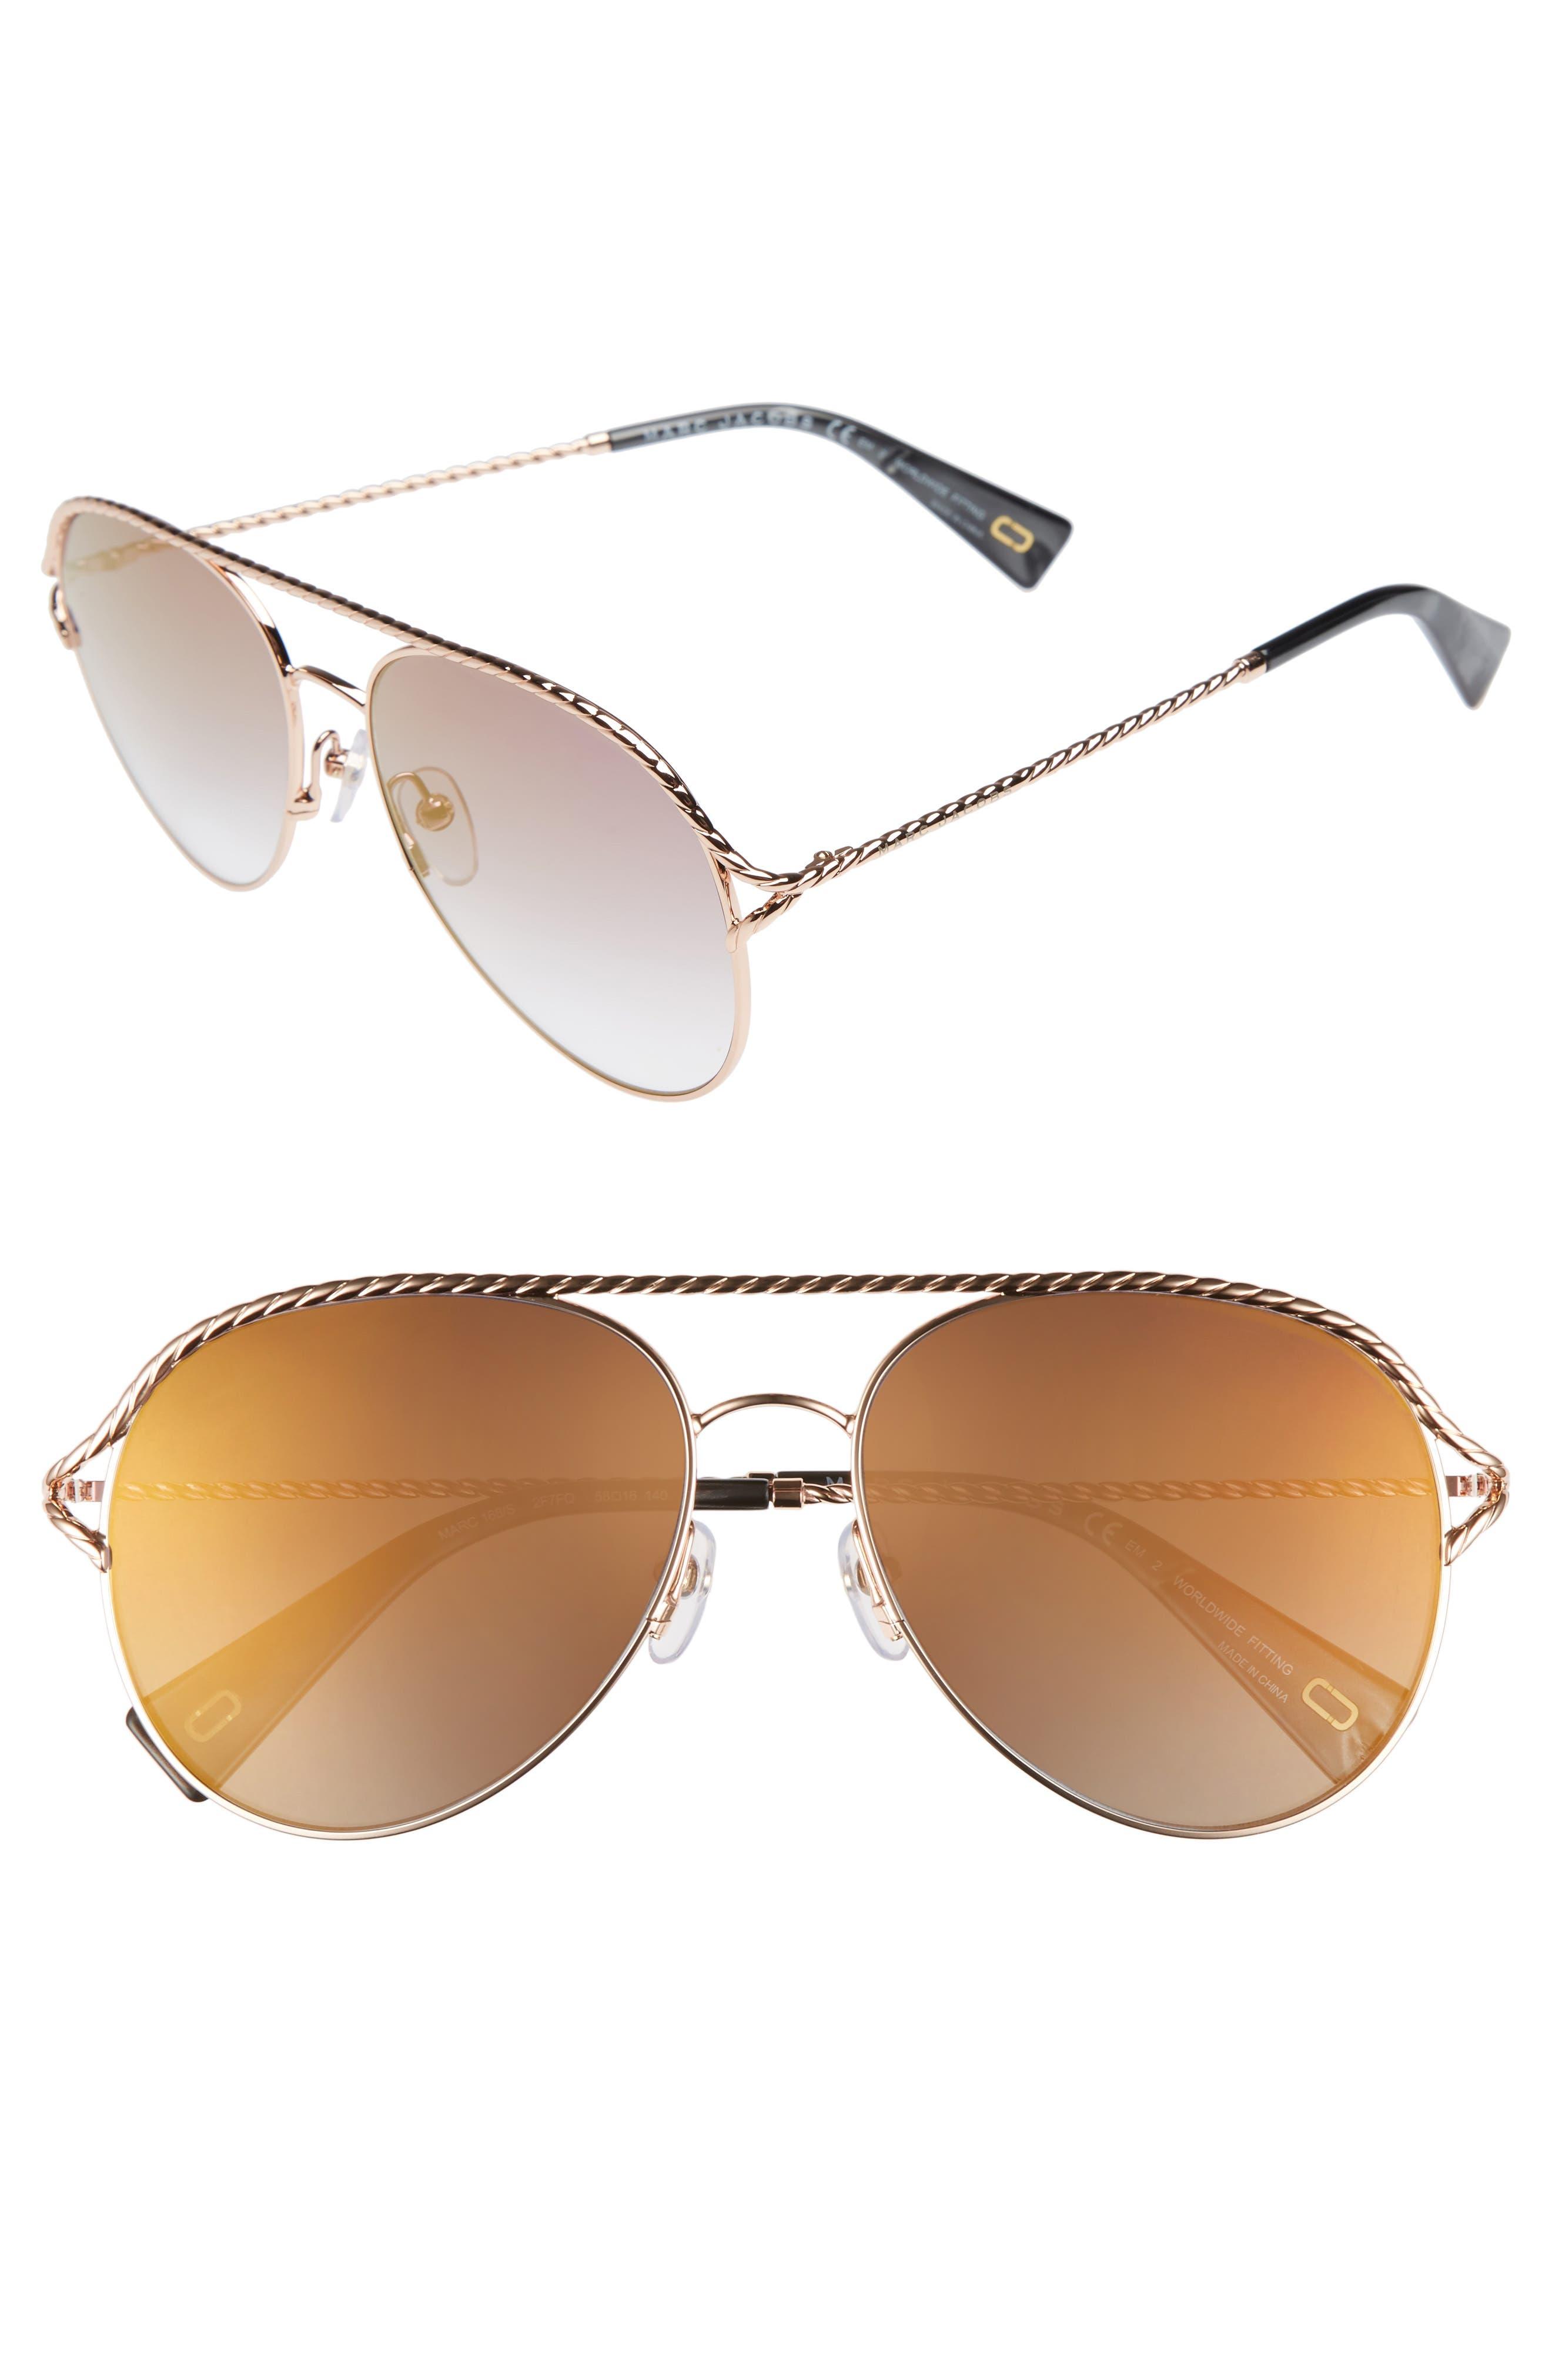 58mm Aviator Sunglasses,                             Main thumbnail 1, color,                             Antique Gold Green